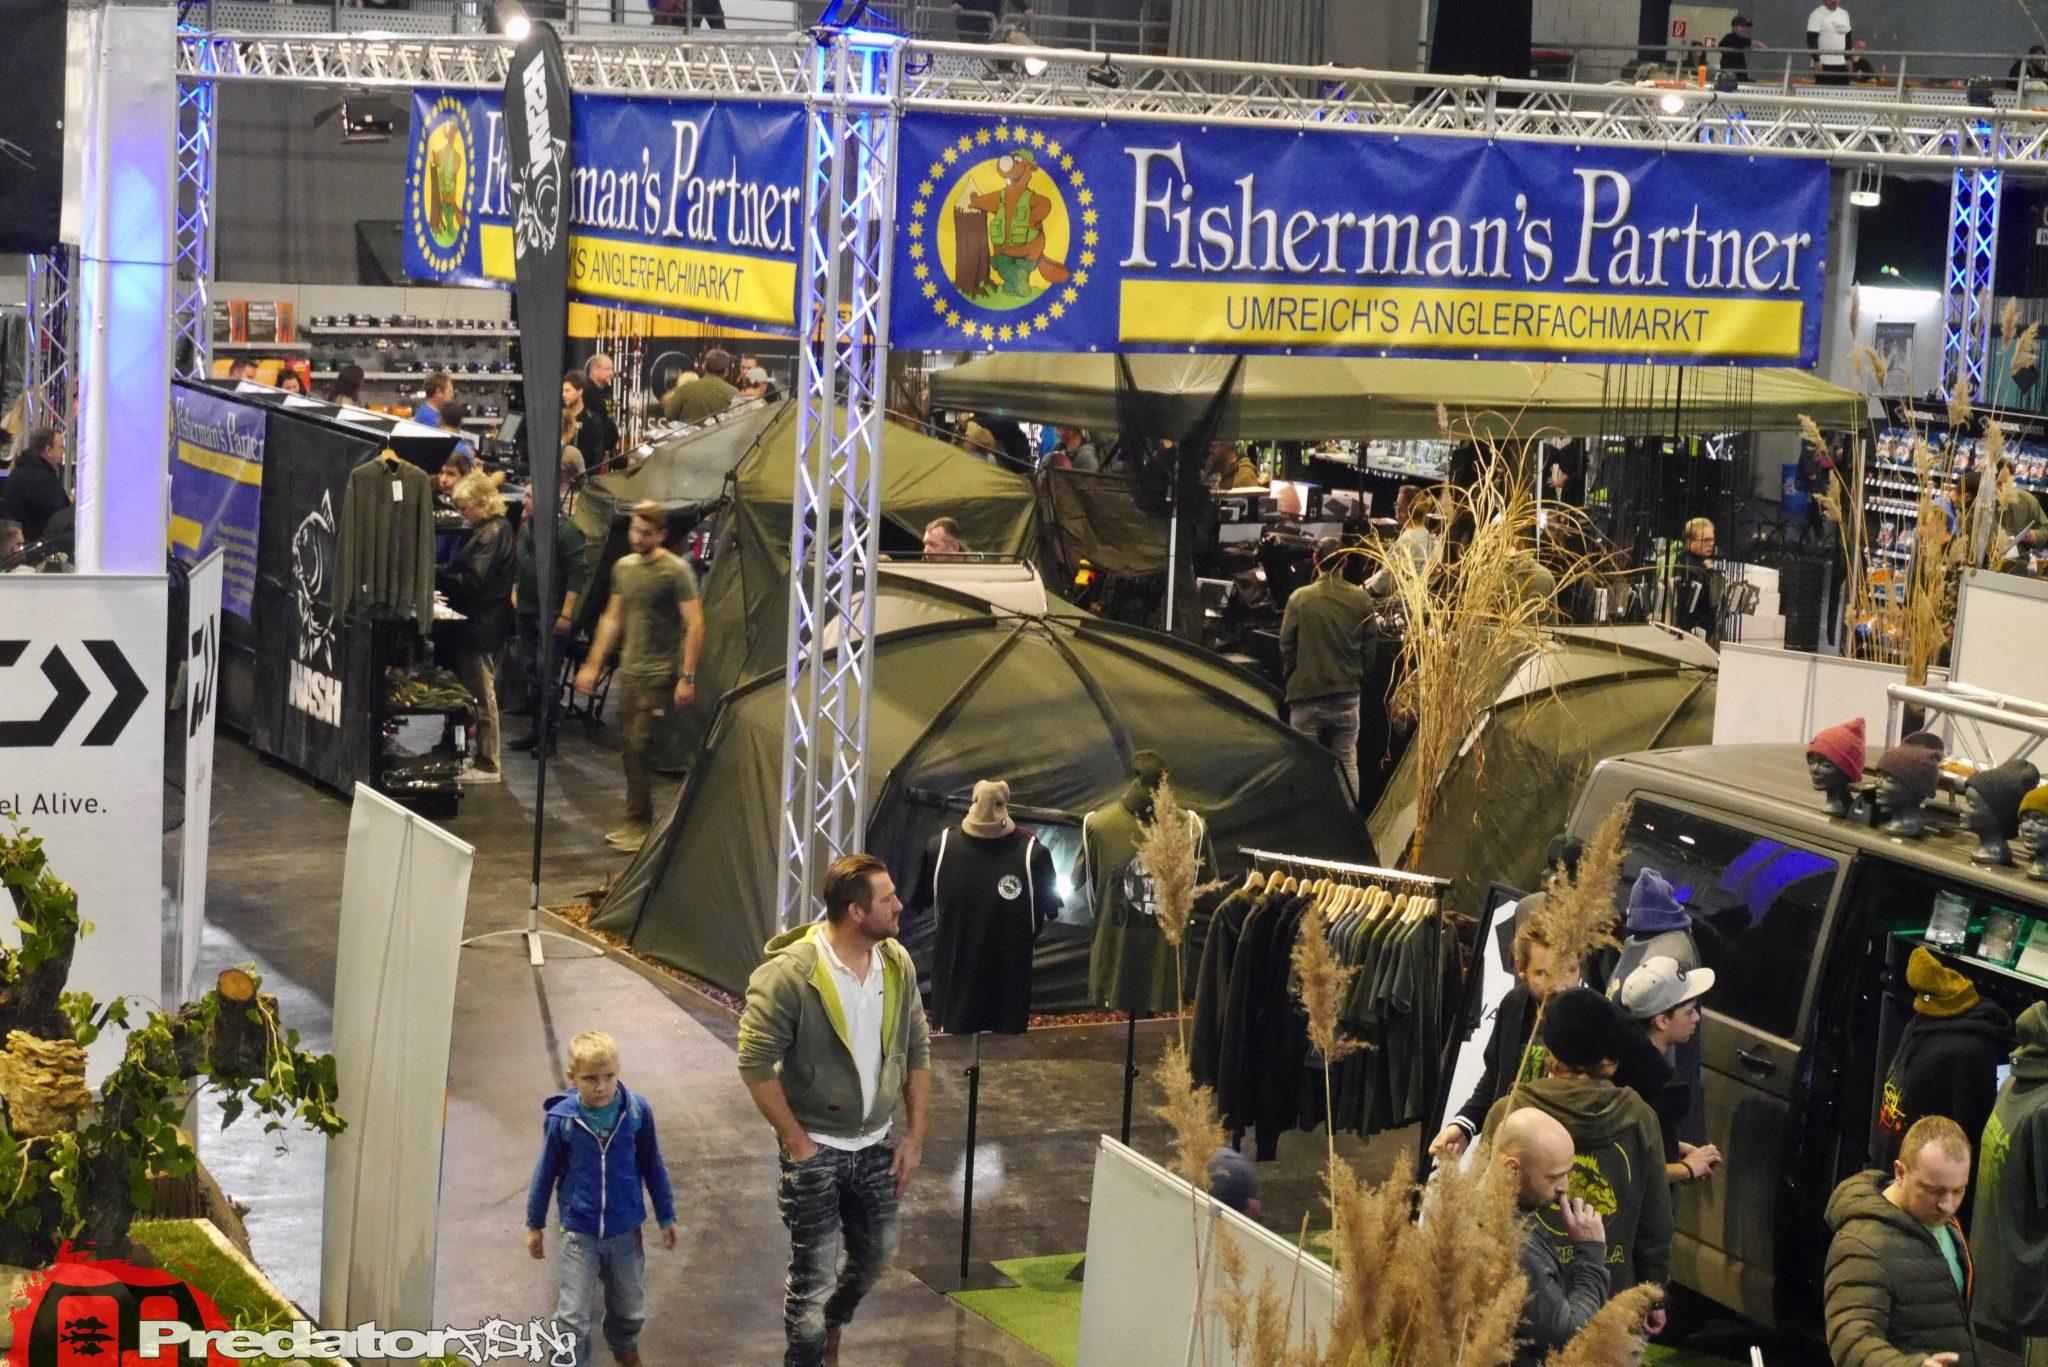 Spirit of Fishing 2017 Fishermans Partner